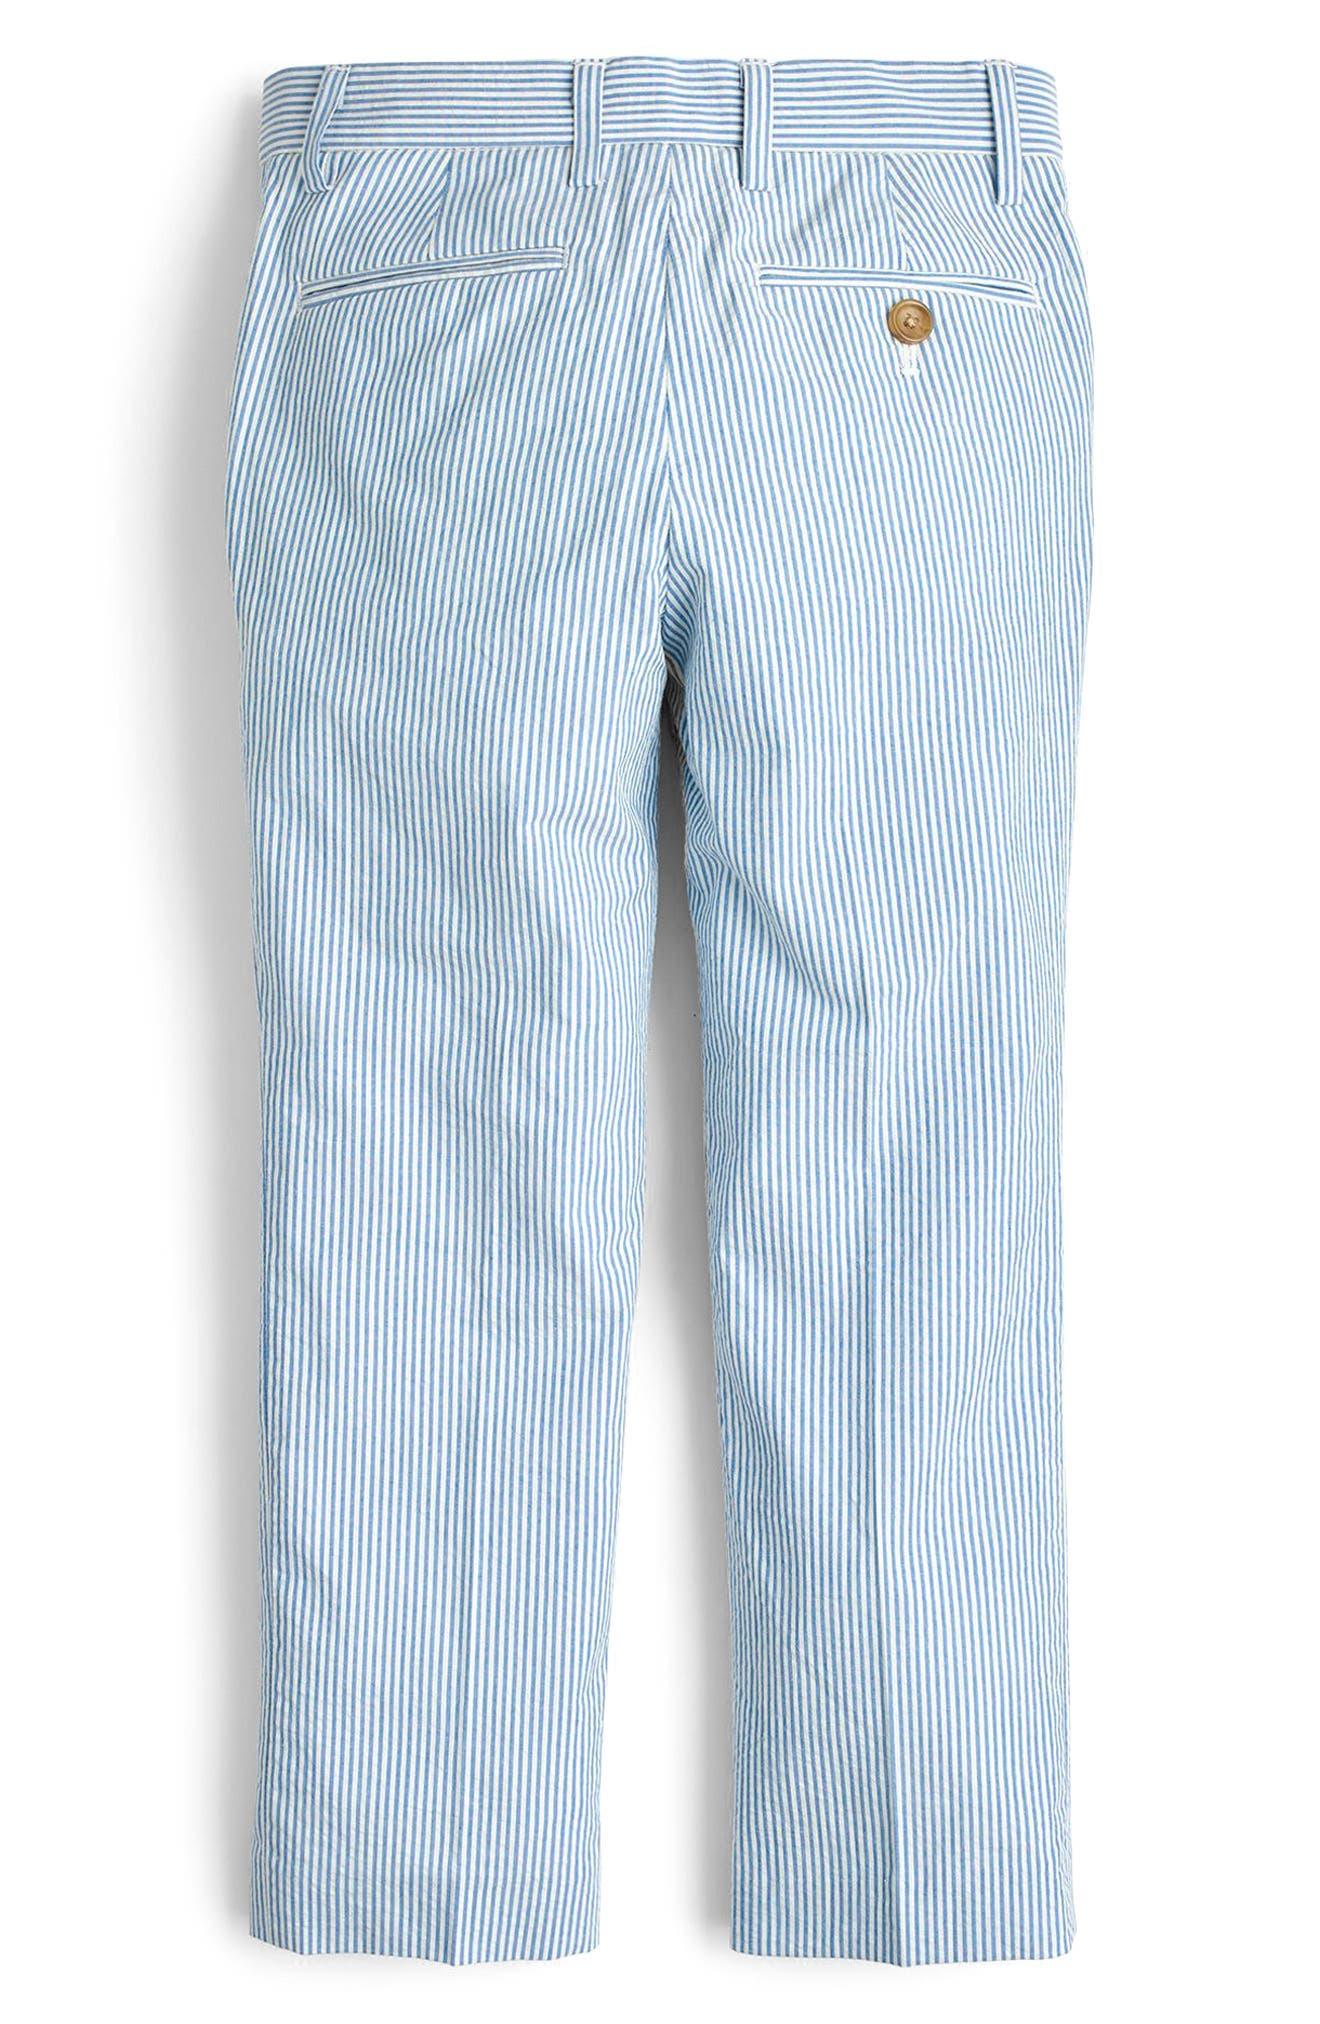 Ludlow Seersucker Pants,                             Alternate thumbnail 2, color,                             400